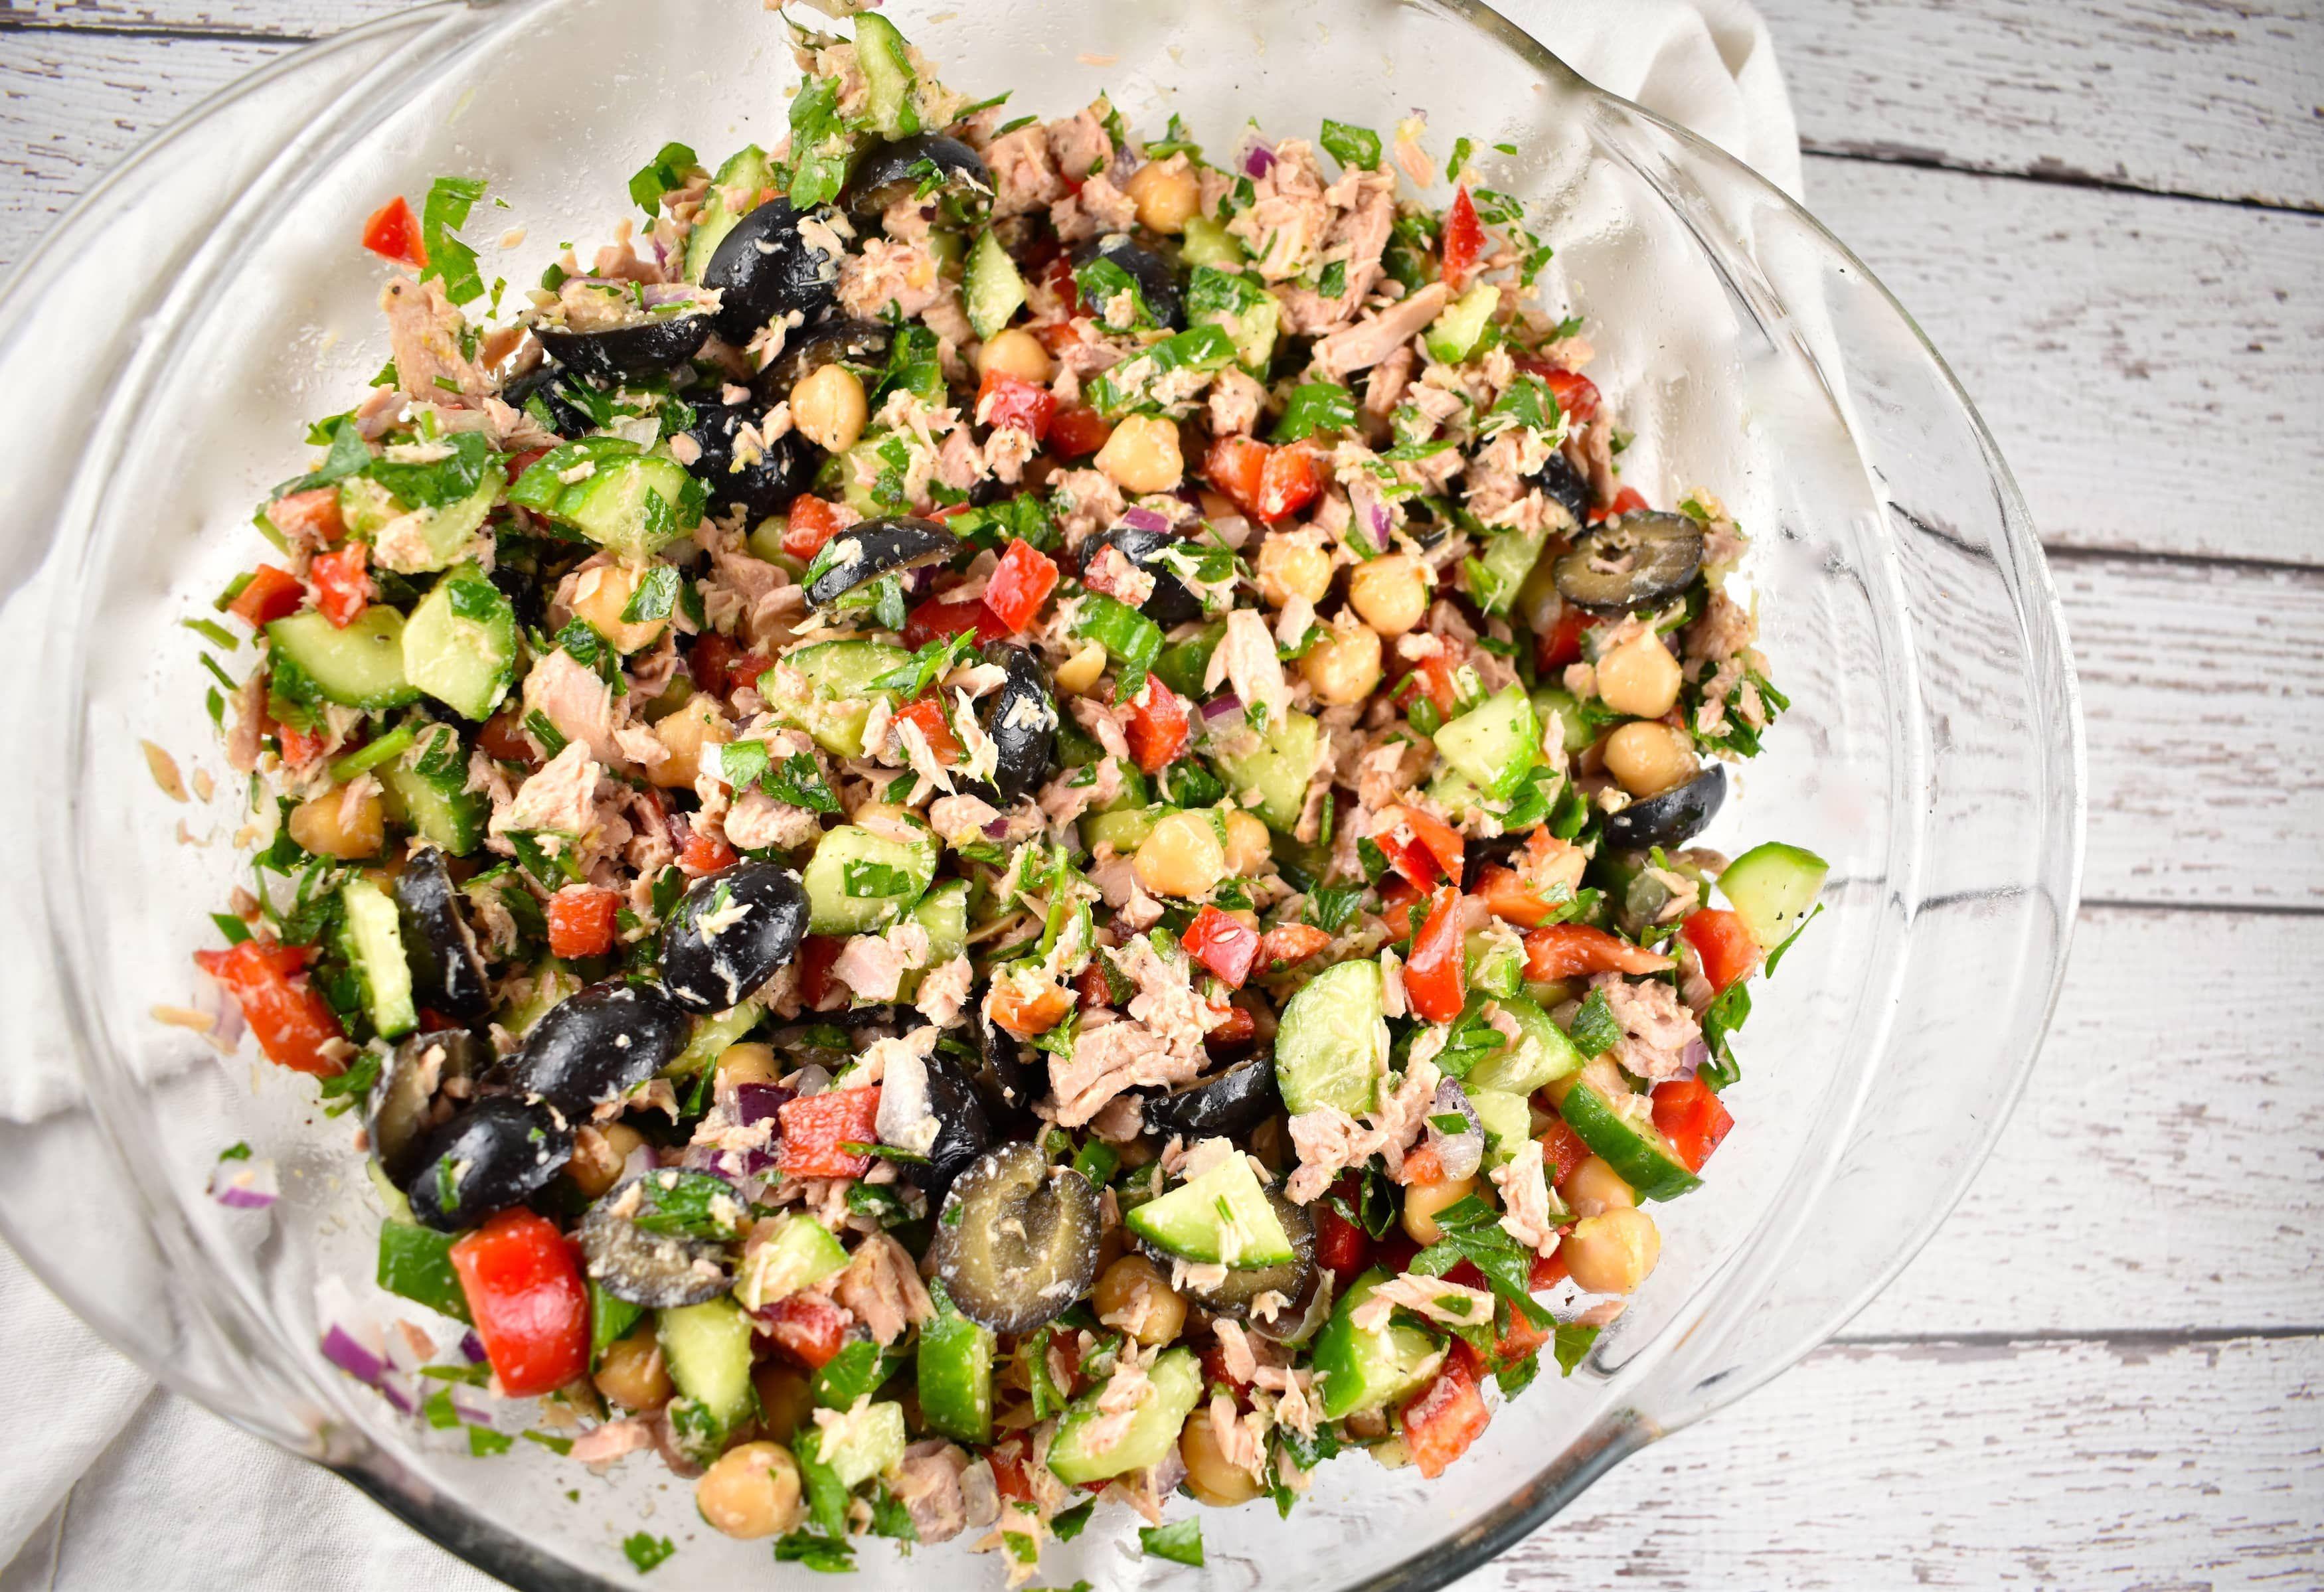 Whole Foods Vegan Chicken Salad Recipe Tarragon